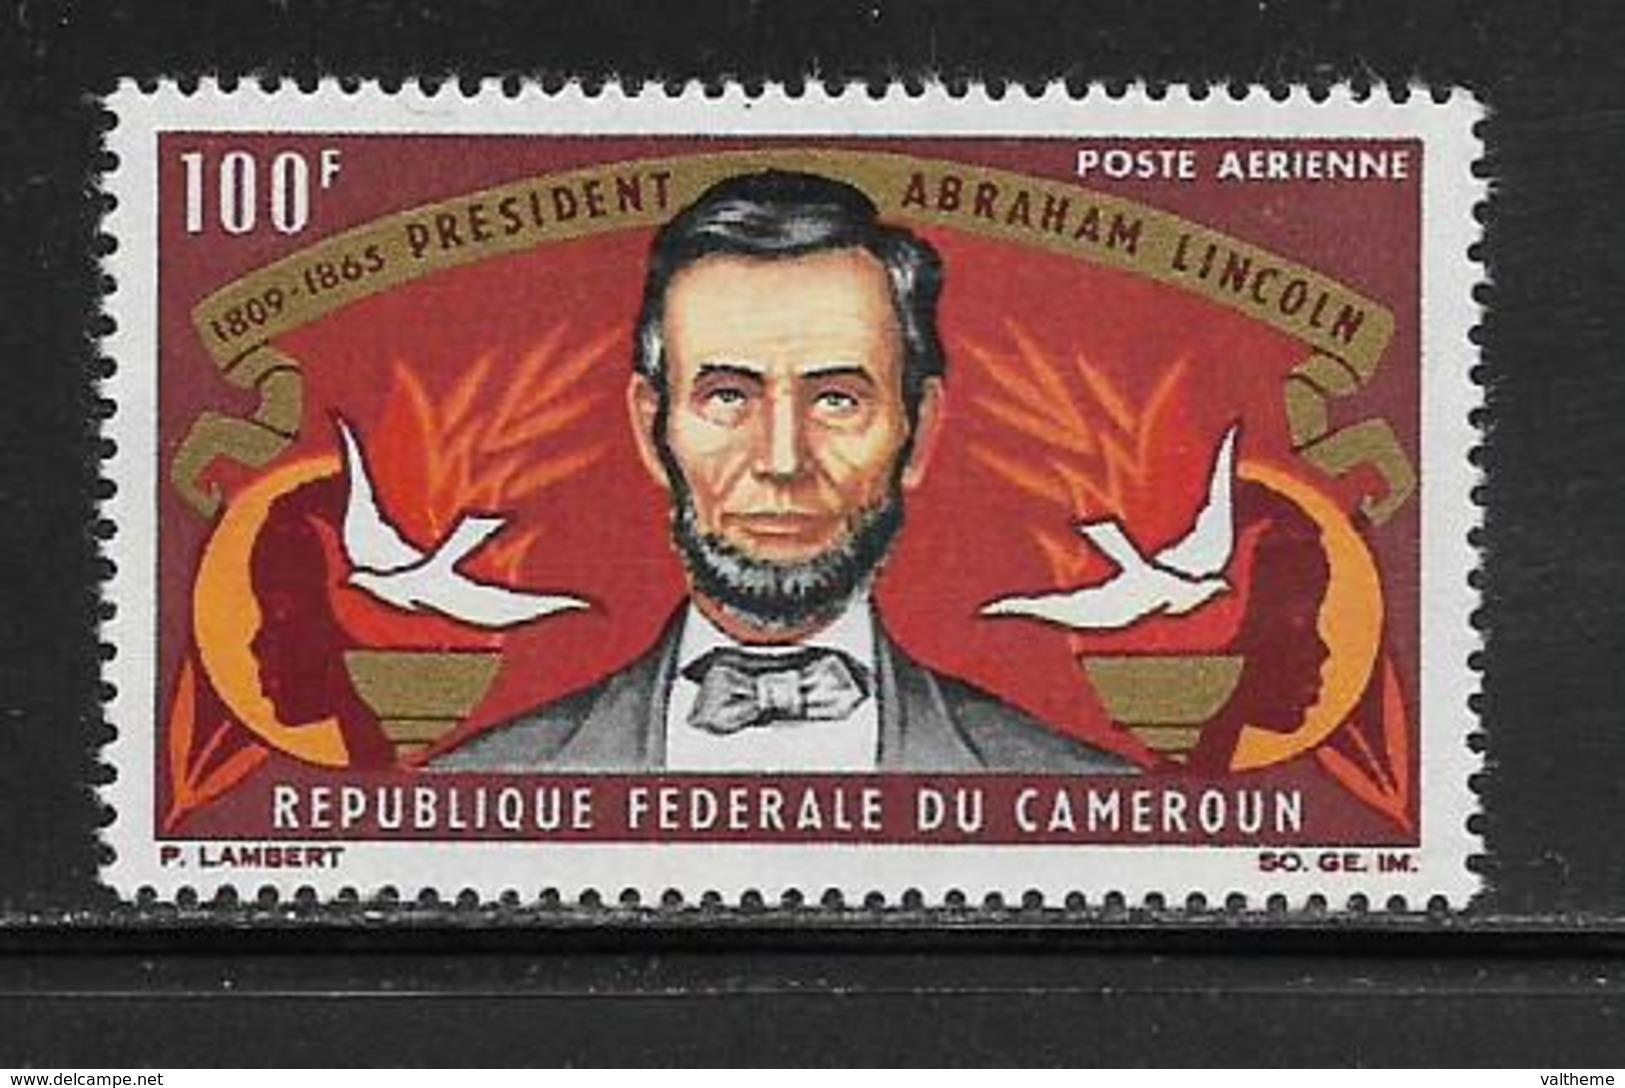 CAMEROUN  ( AFCA - 53 )  1965  N° YVERT ET TELLIER  POSTE AERIENNE N° 64   N** - Cameroun (1960-...)